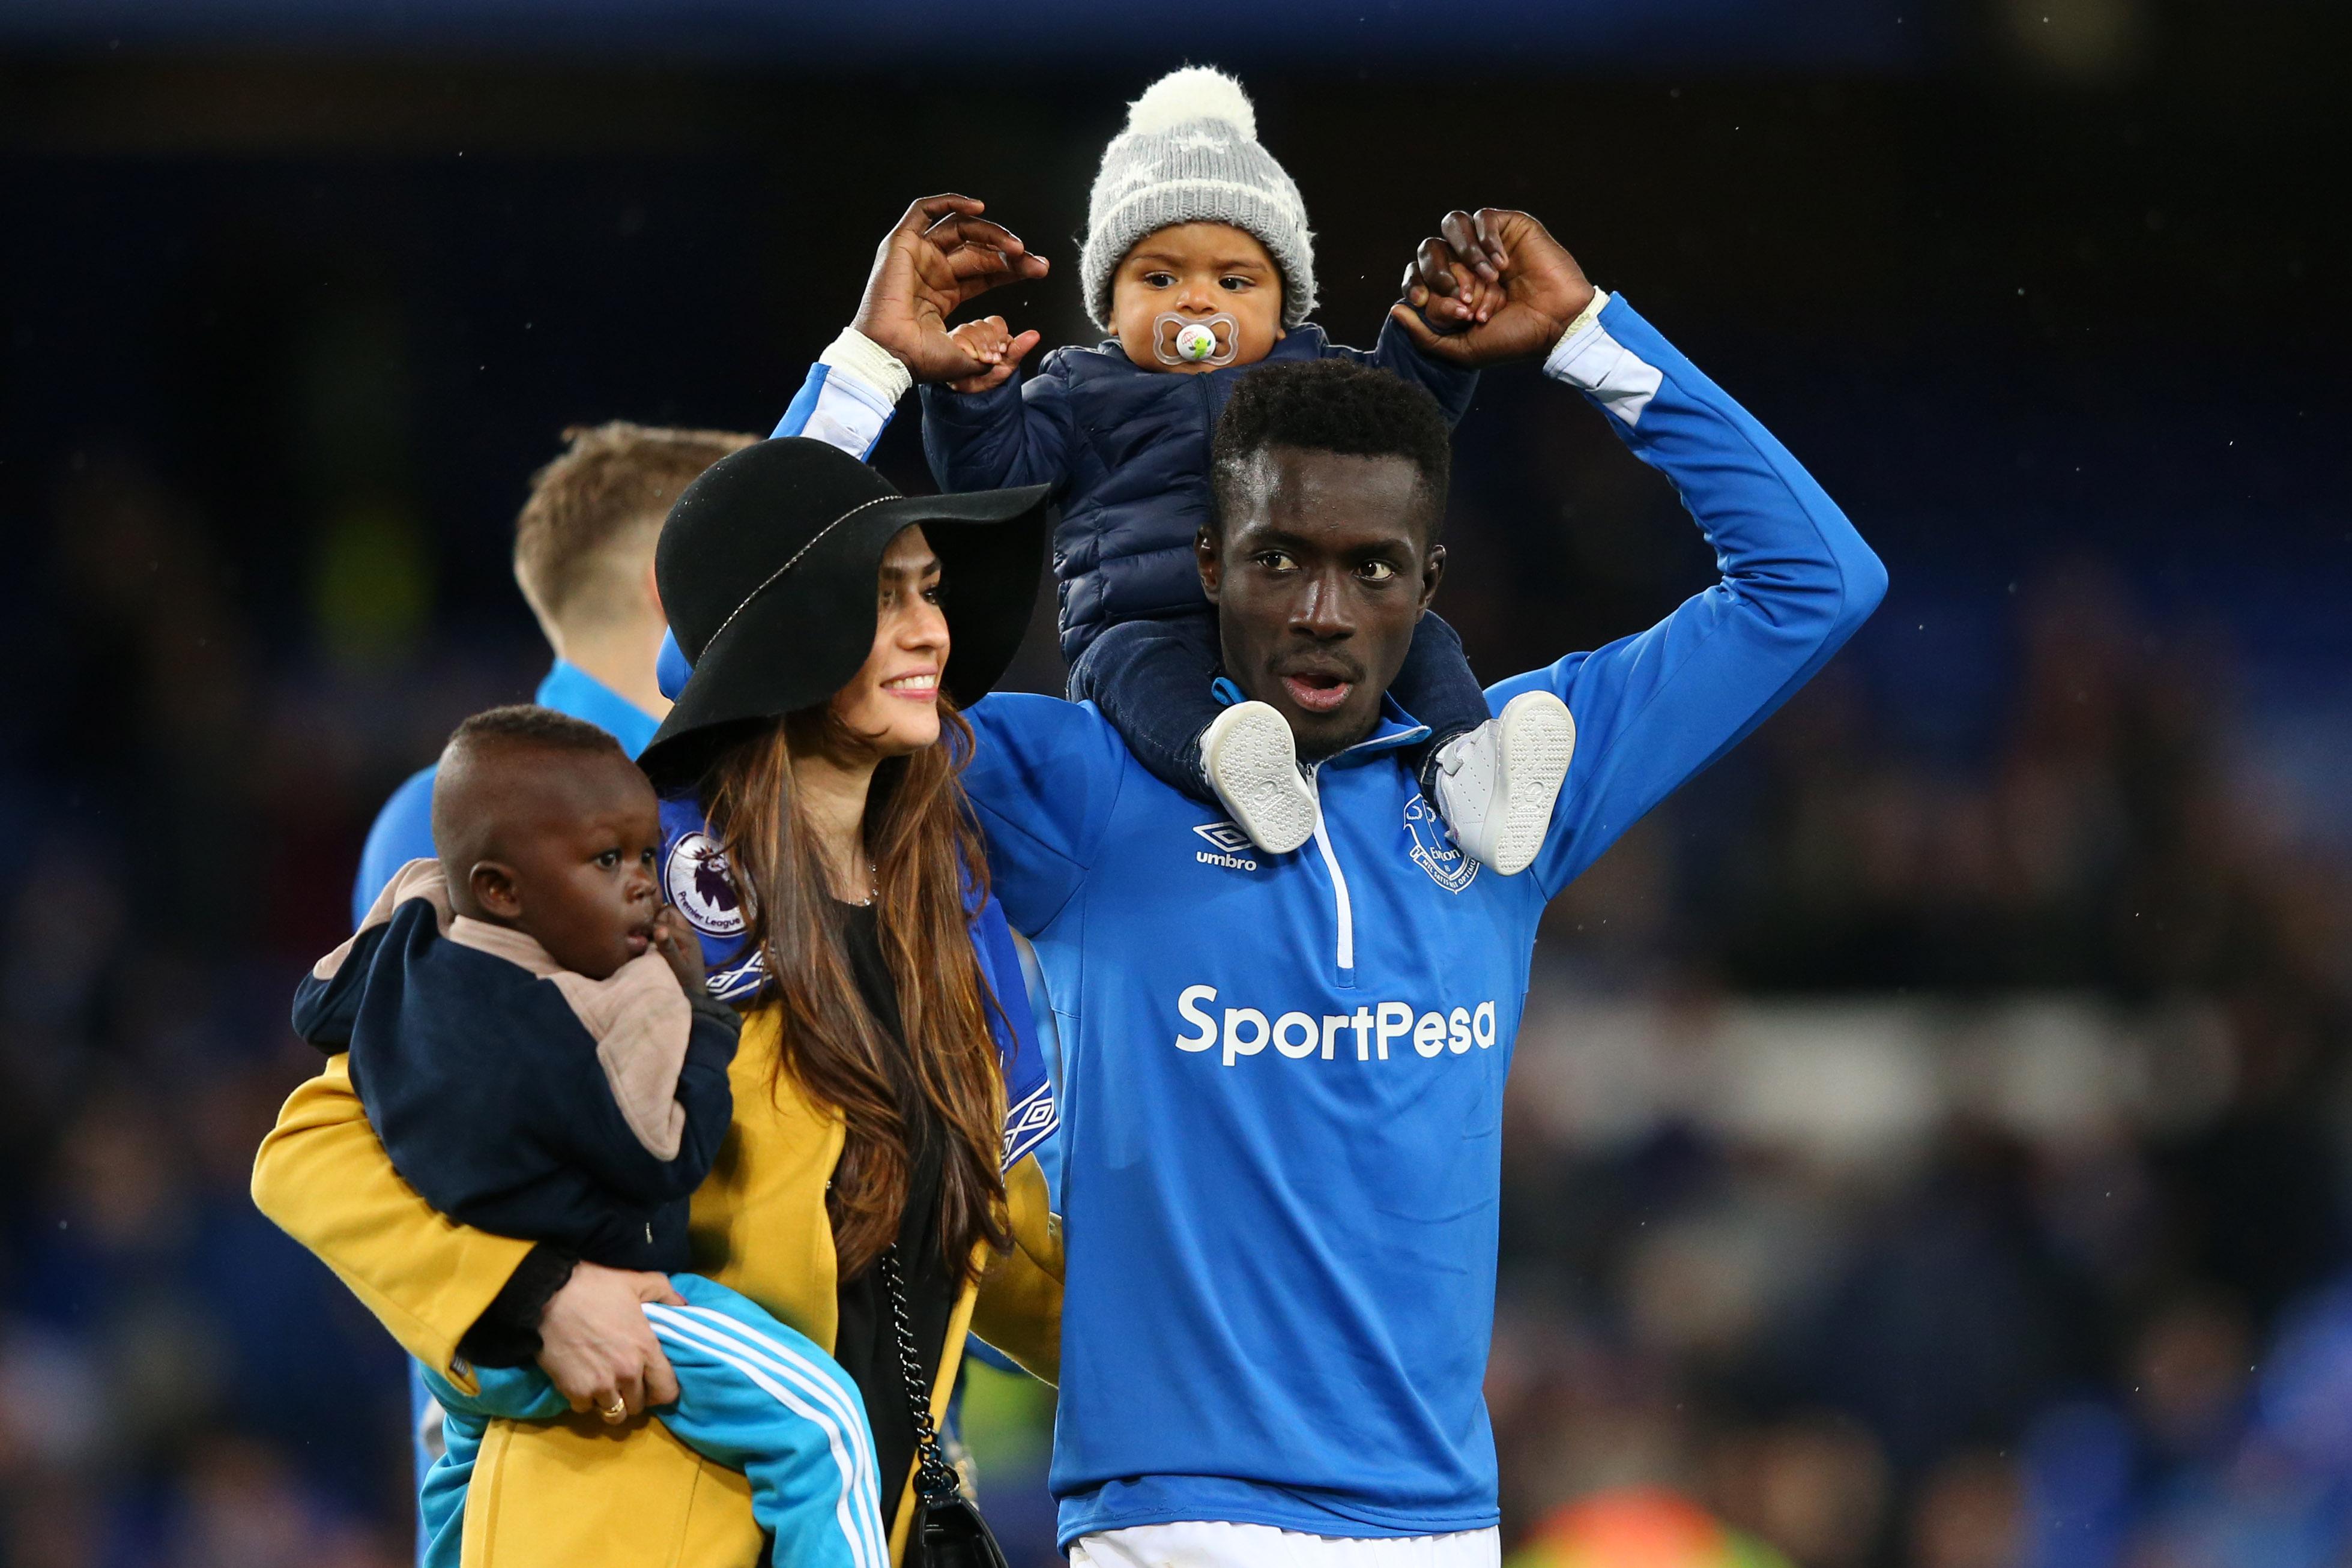 Idrissa Gueye snubbed in ESPN's AFCON best player list